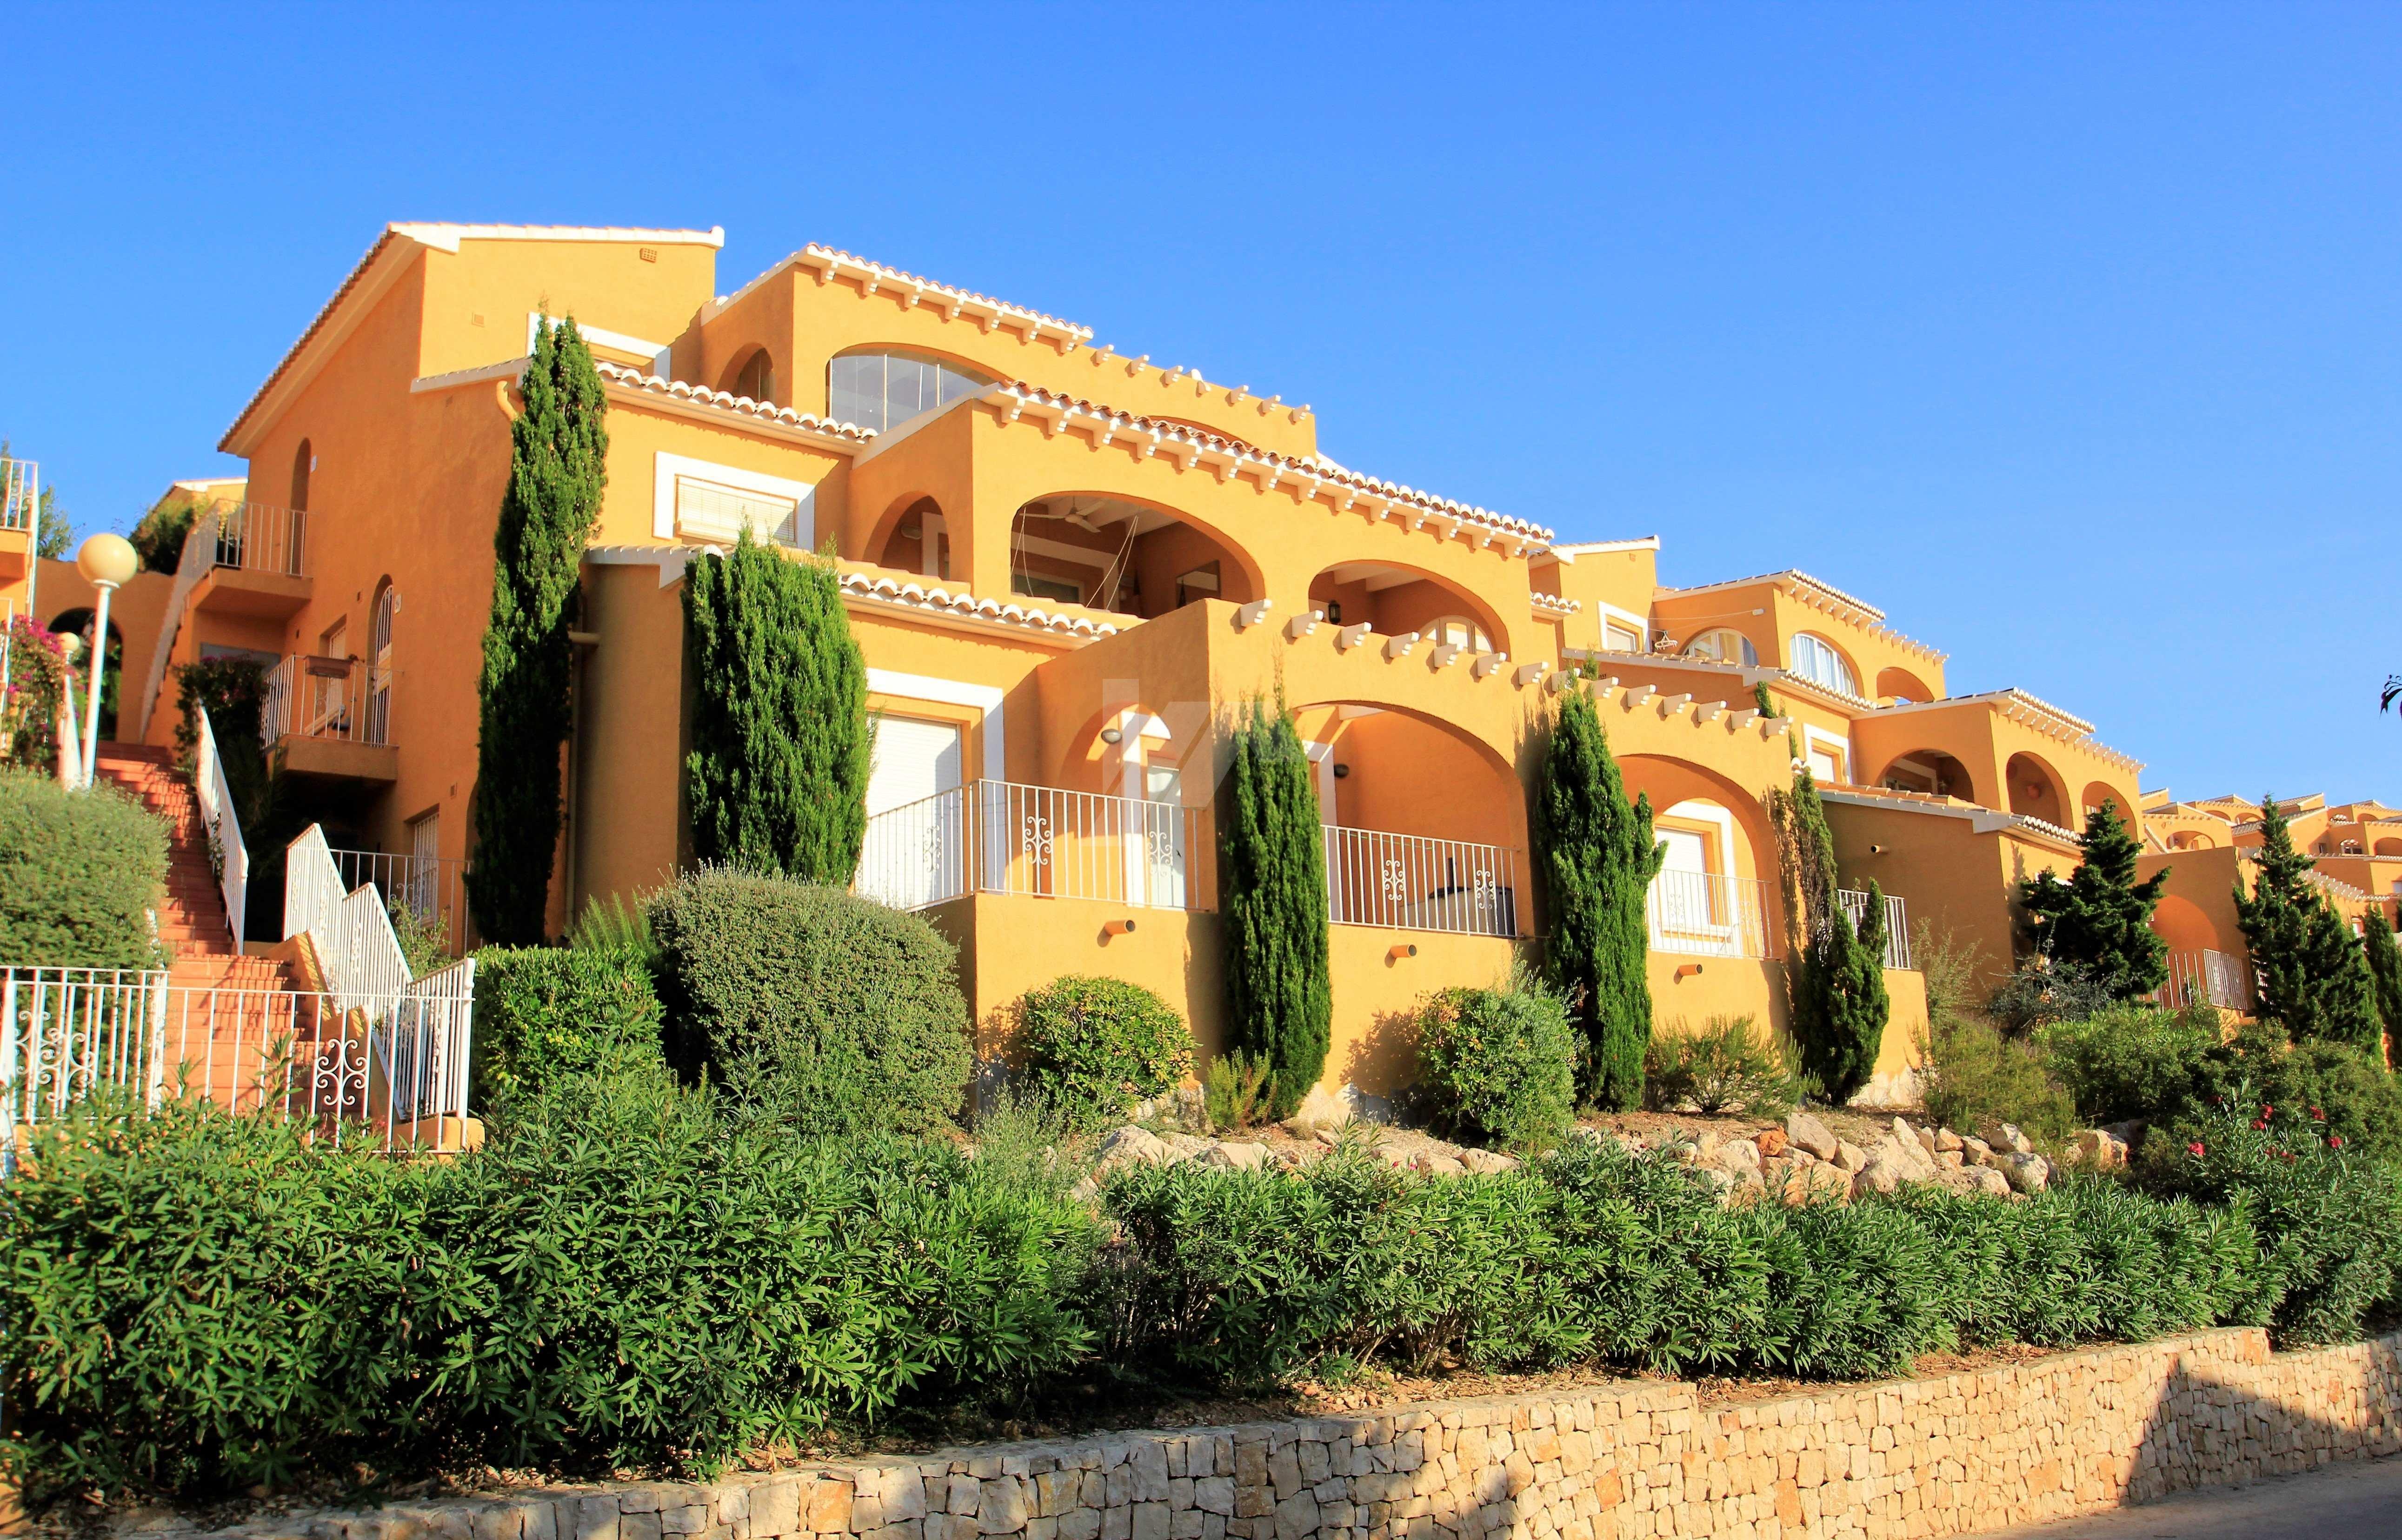 Apartment for sale in Benitachell, Costa Blanca.